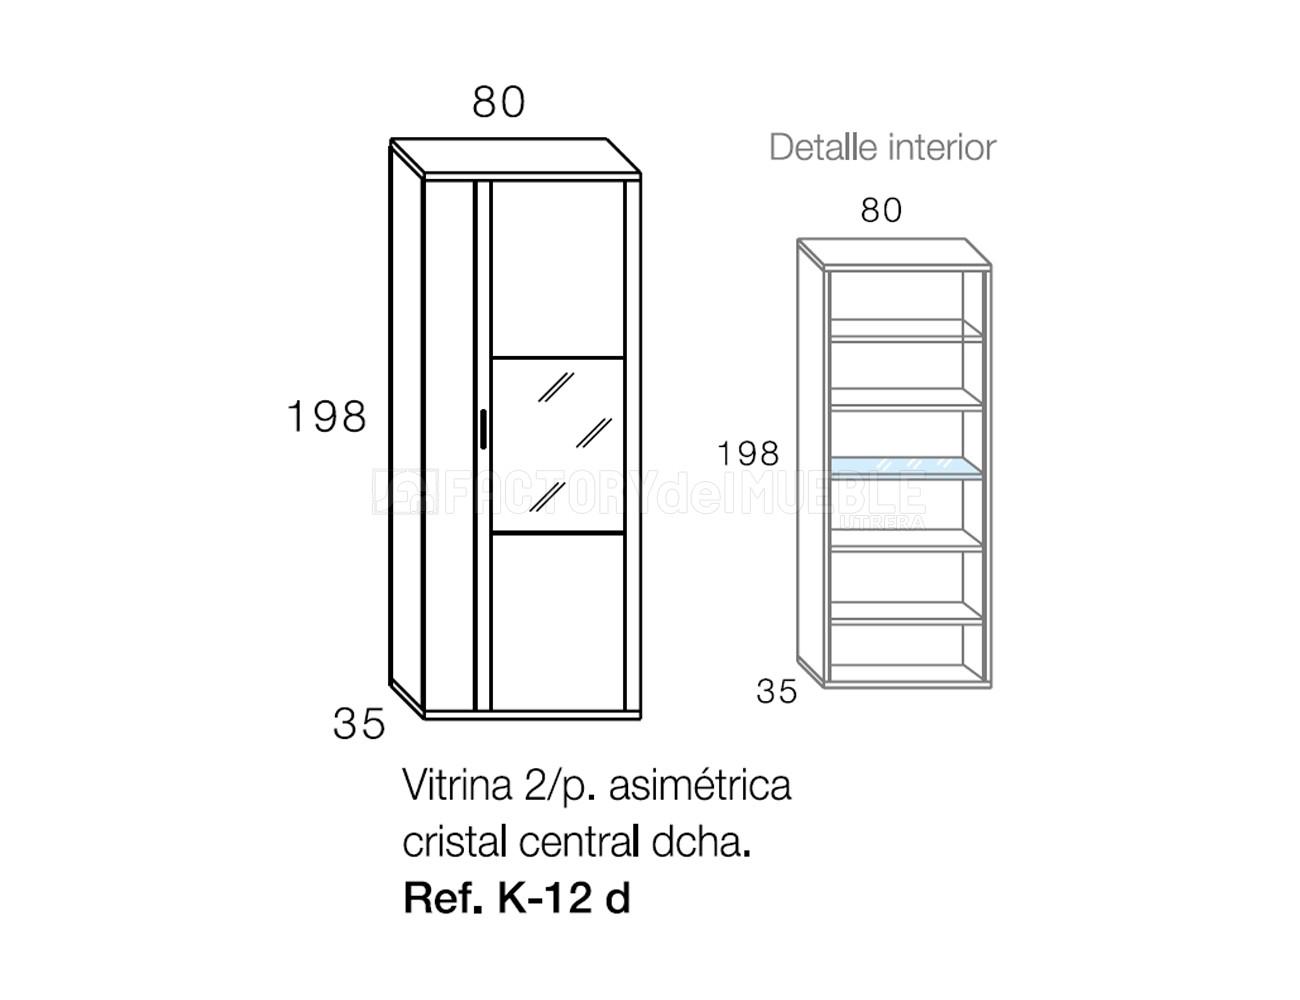 Vitrina k12d